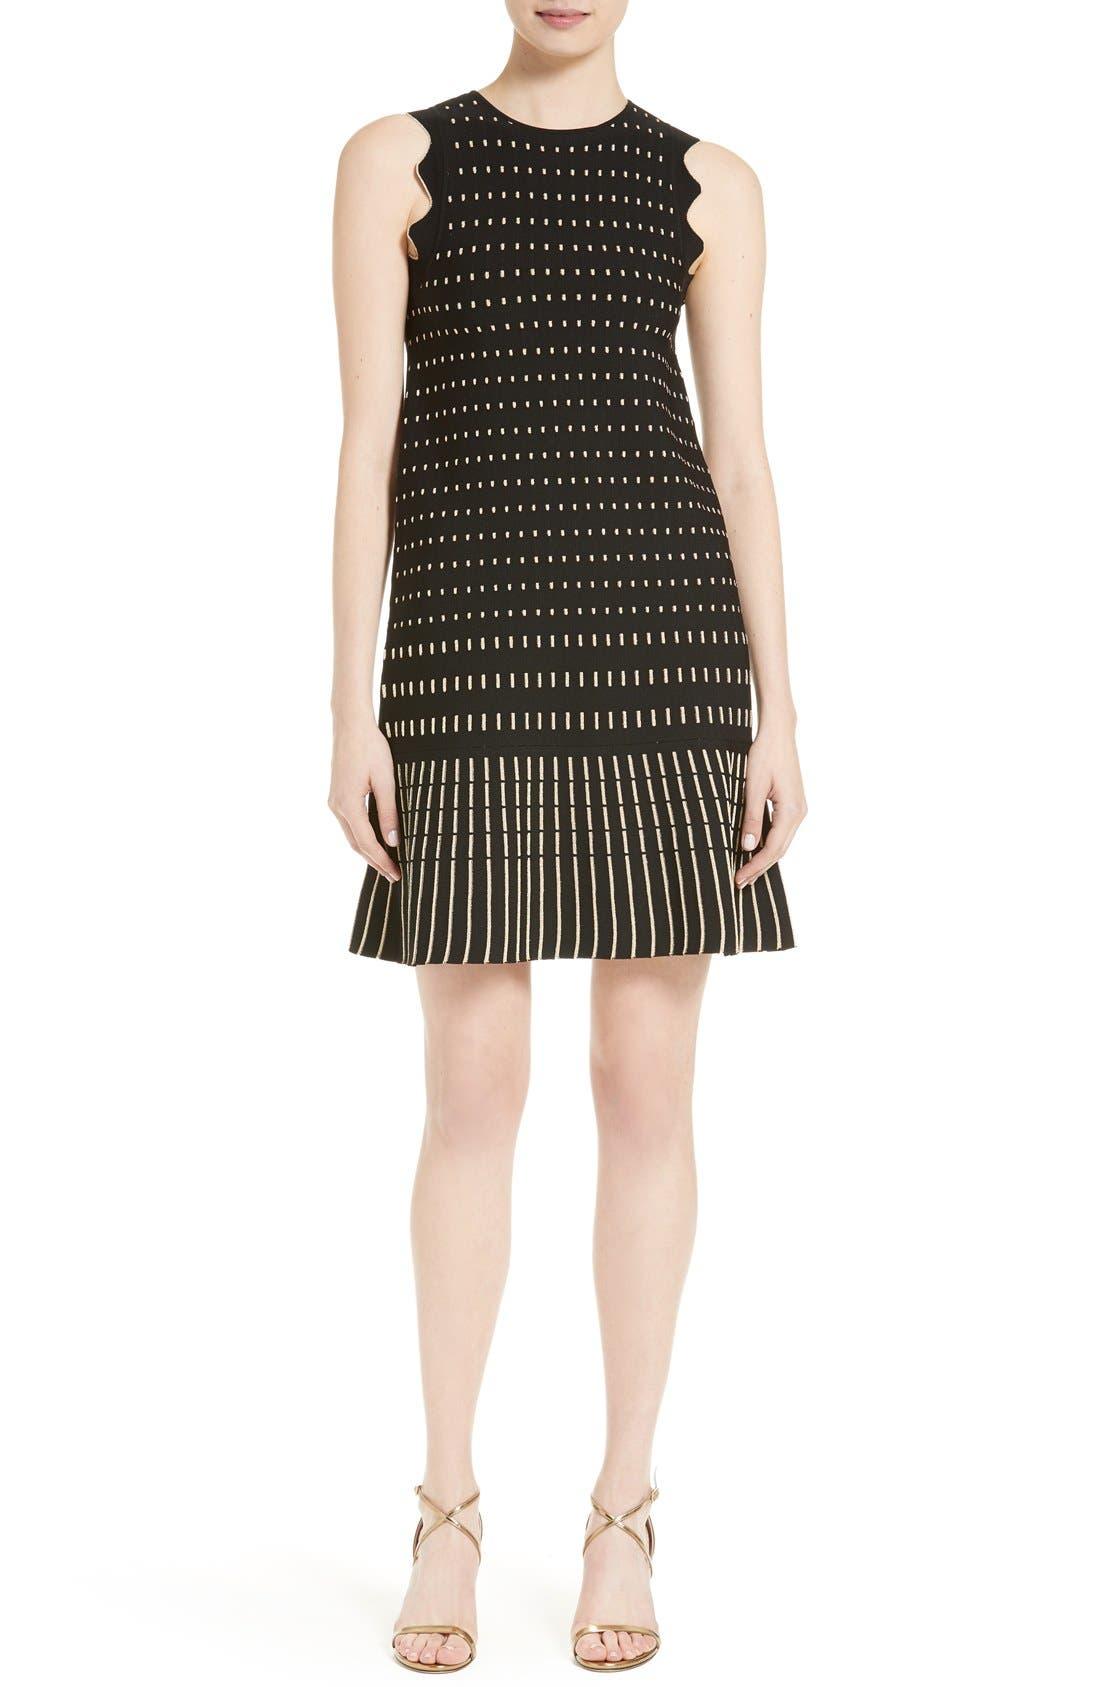 Alternate Image 1 Selected - Ted Baker London Knit Sheath Dress